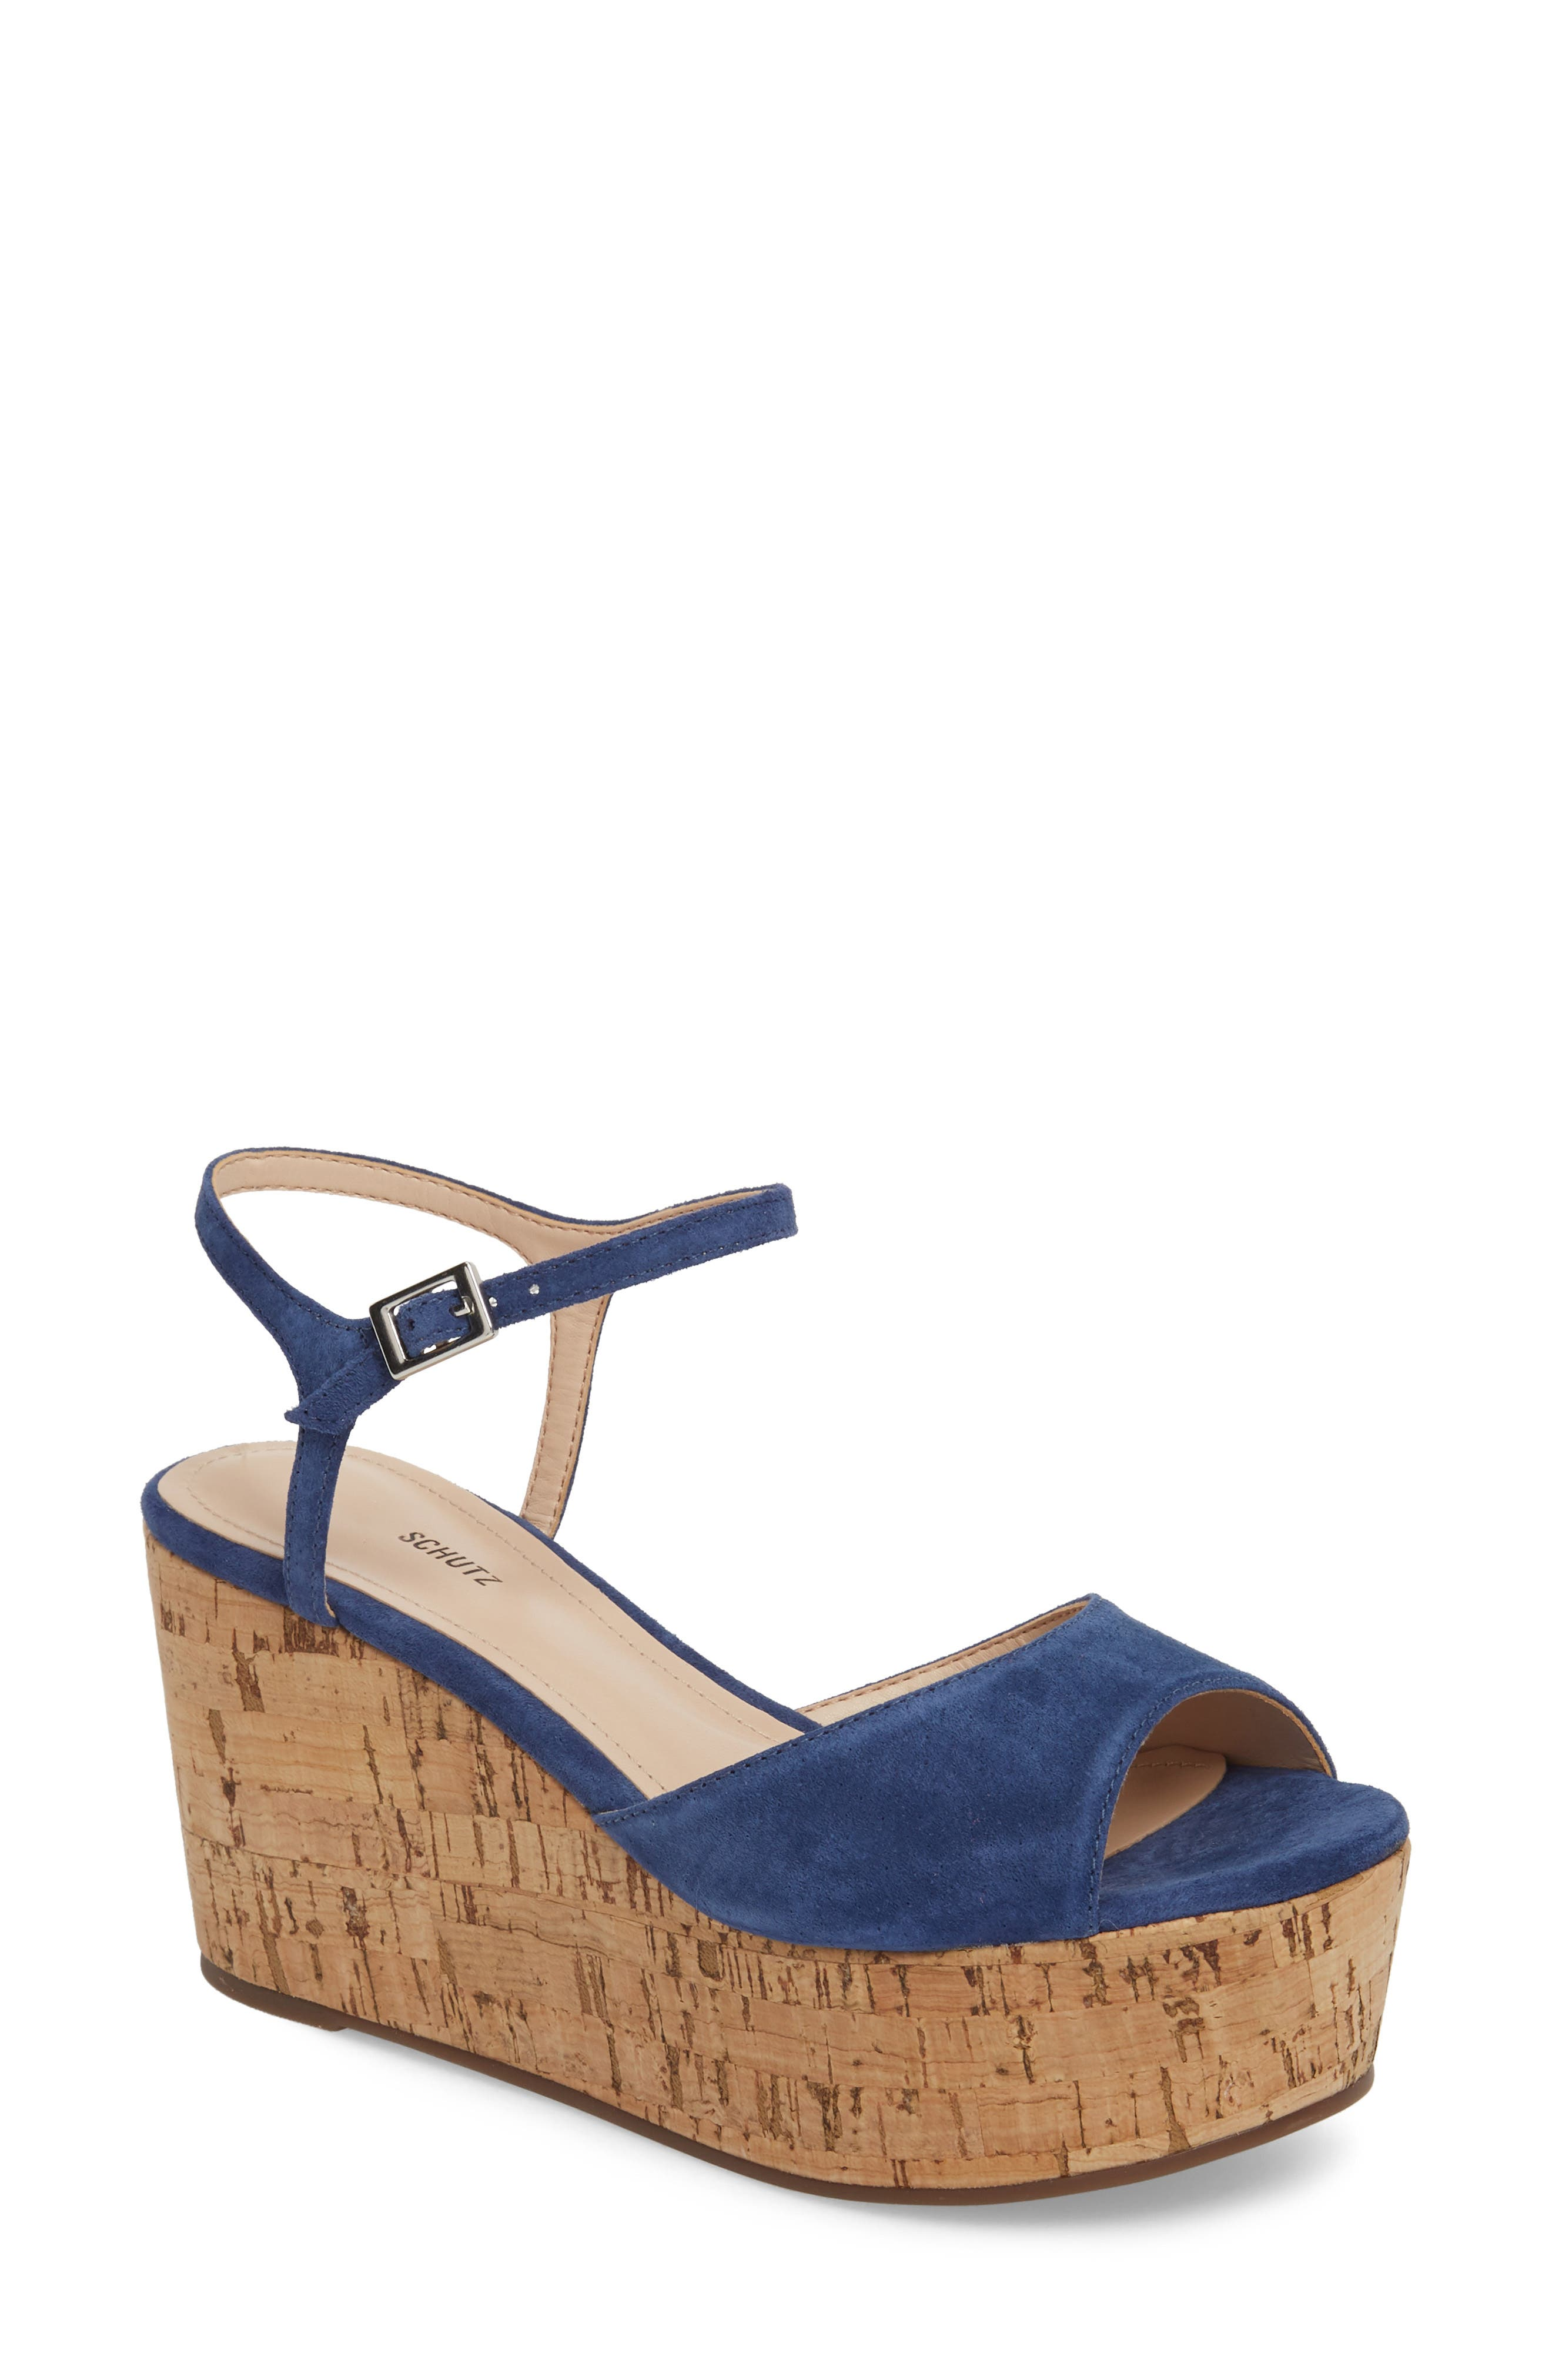 Heloise Platform Wedge Sandal,                             Main thumbnail 1, color,                             Dress Blue